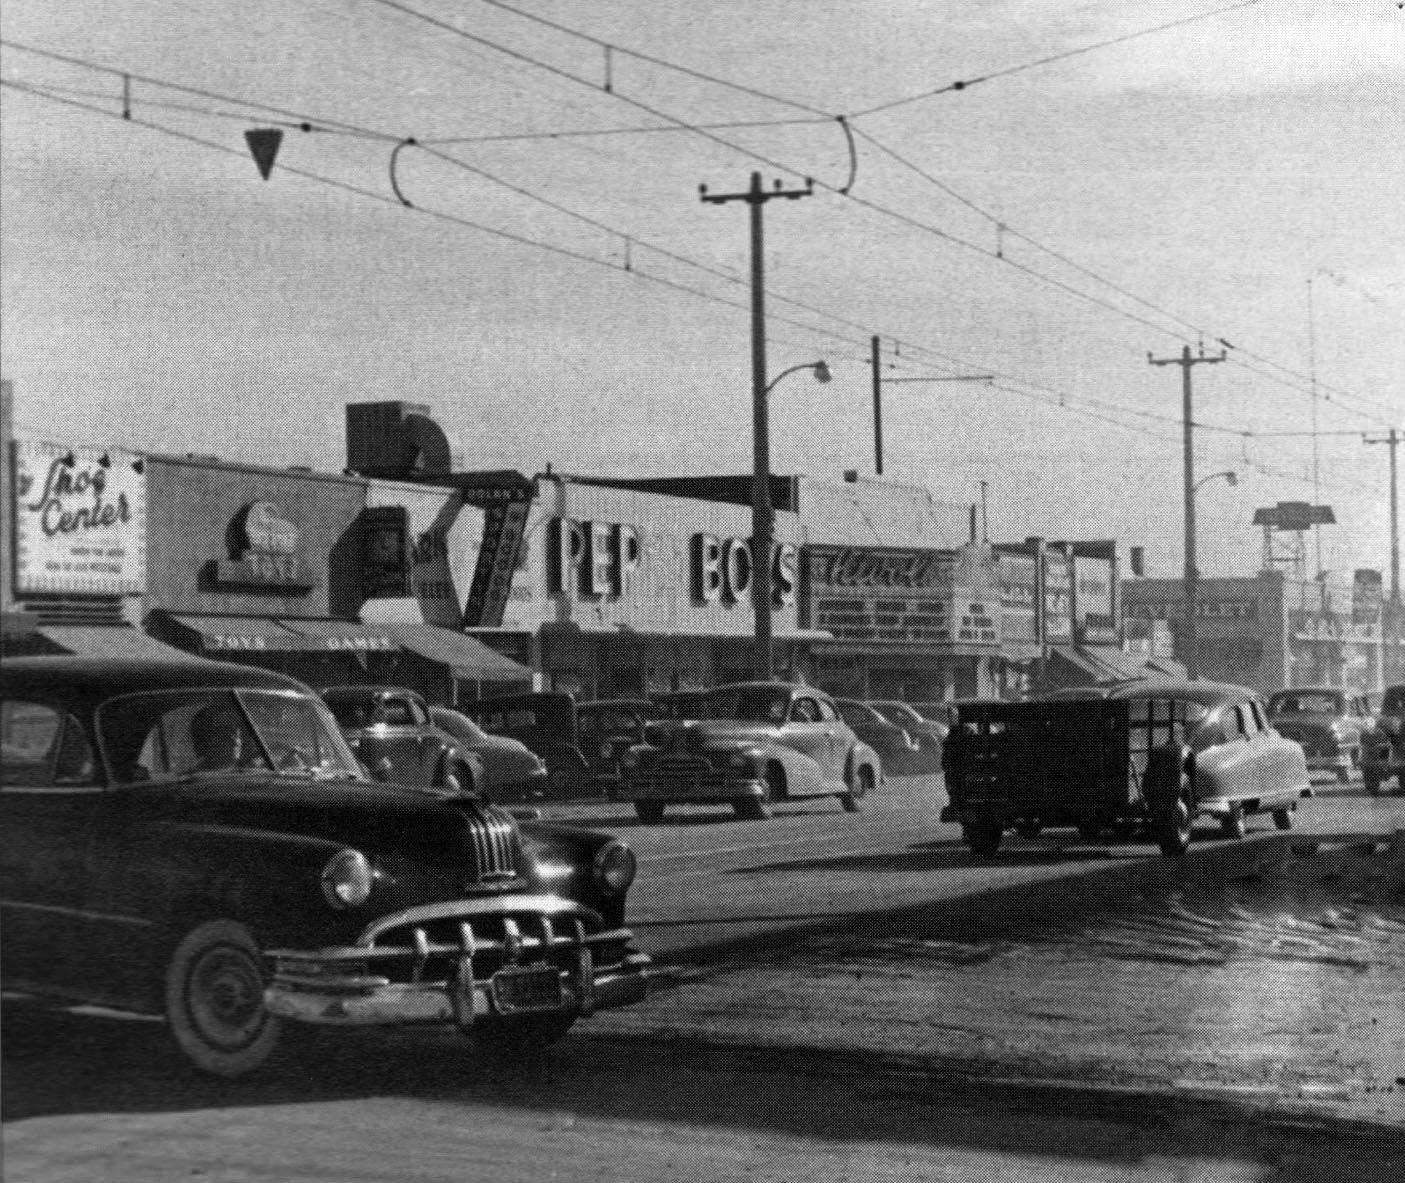 1952 Van Nuys Blvd. San Fernando Valley (how I Remember It